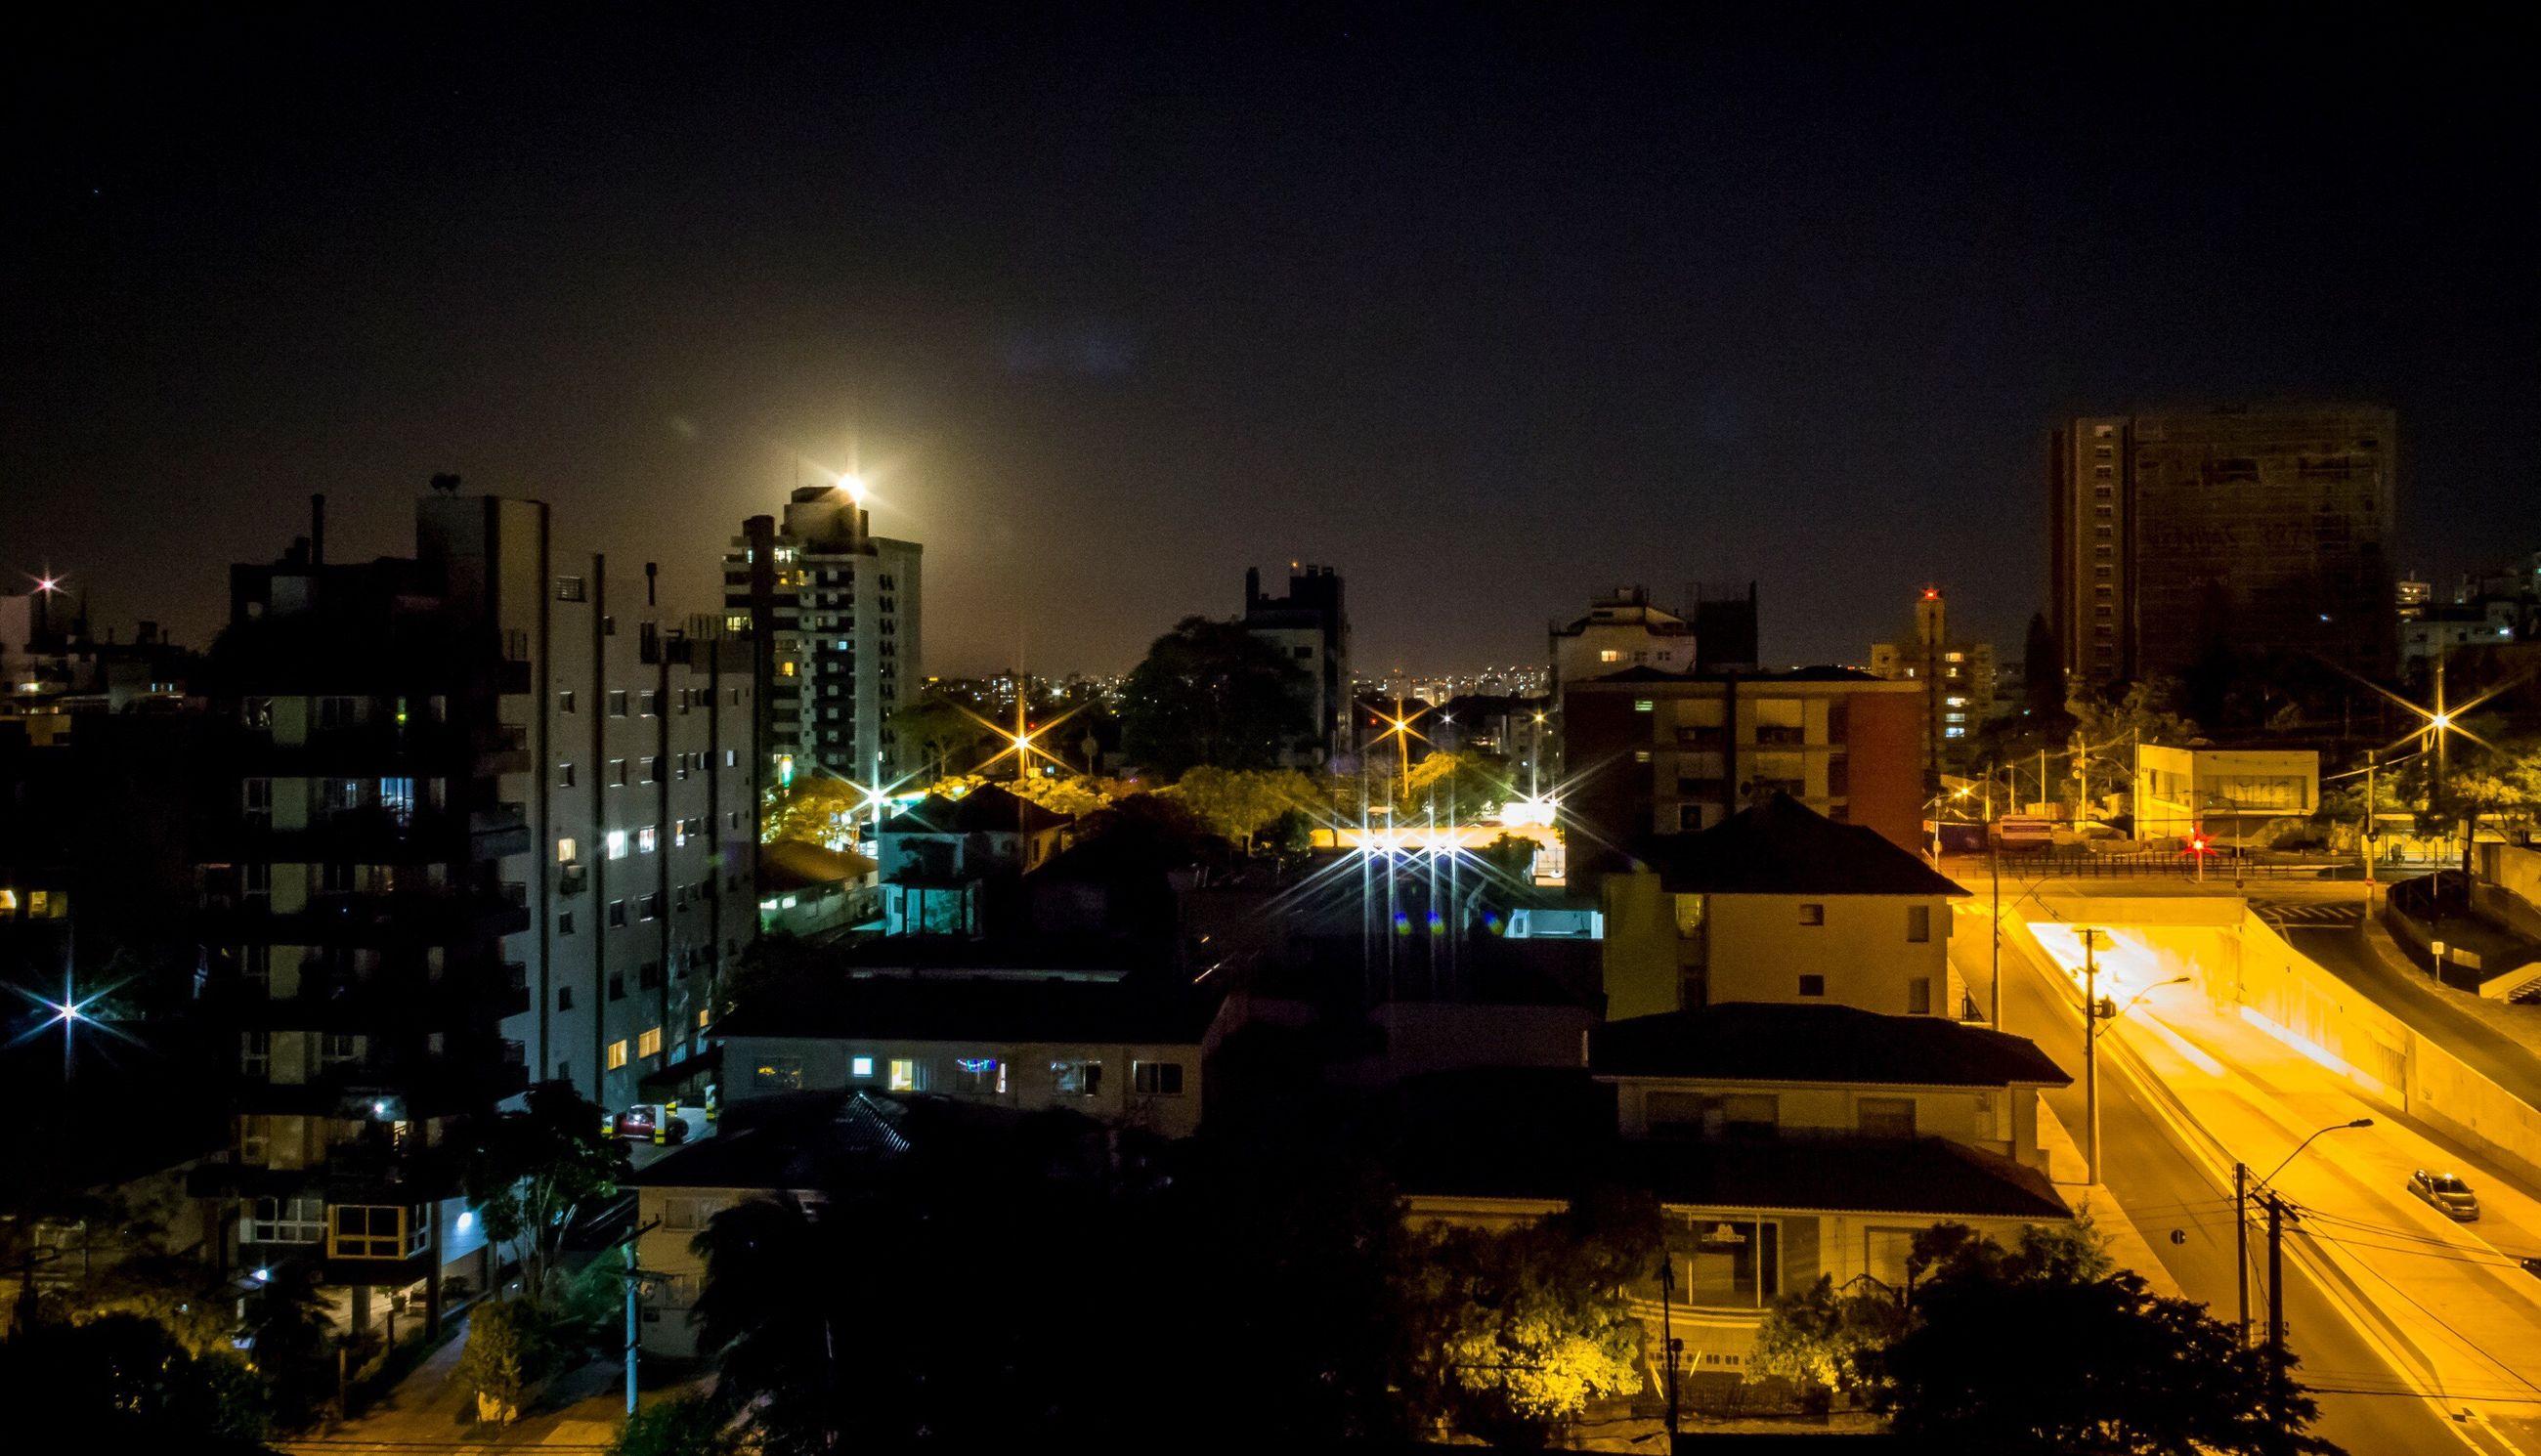 illuminated, night, city, building exterior, architecture, cityscape, built structure, urban skyline, skyscraper, no people, travel destinations, sky, modern, outdoors